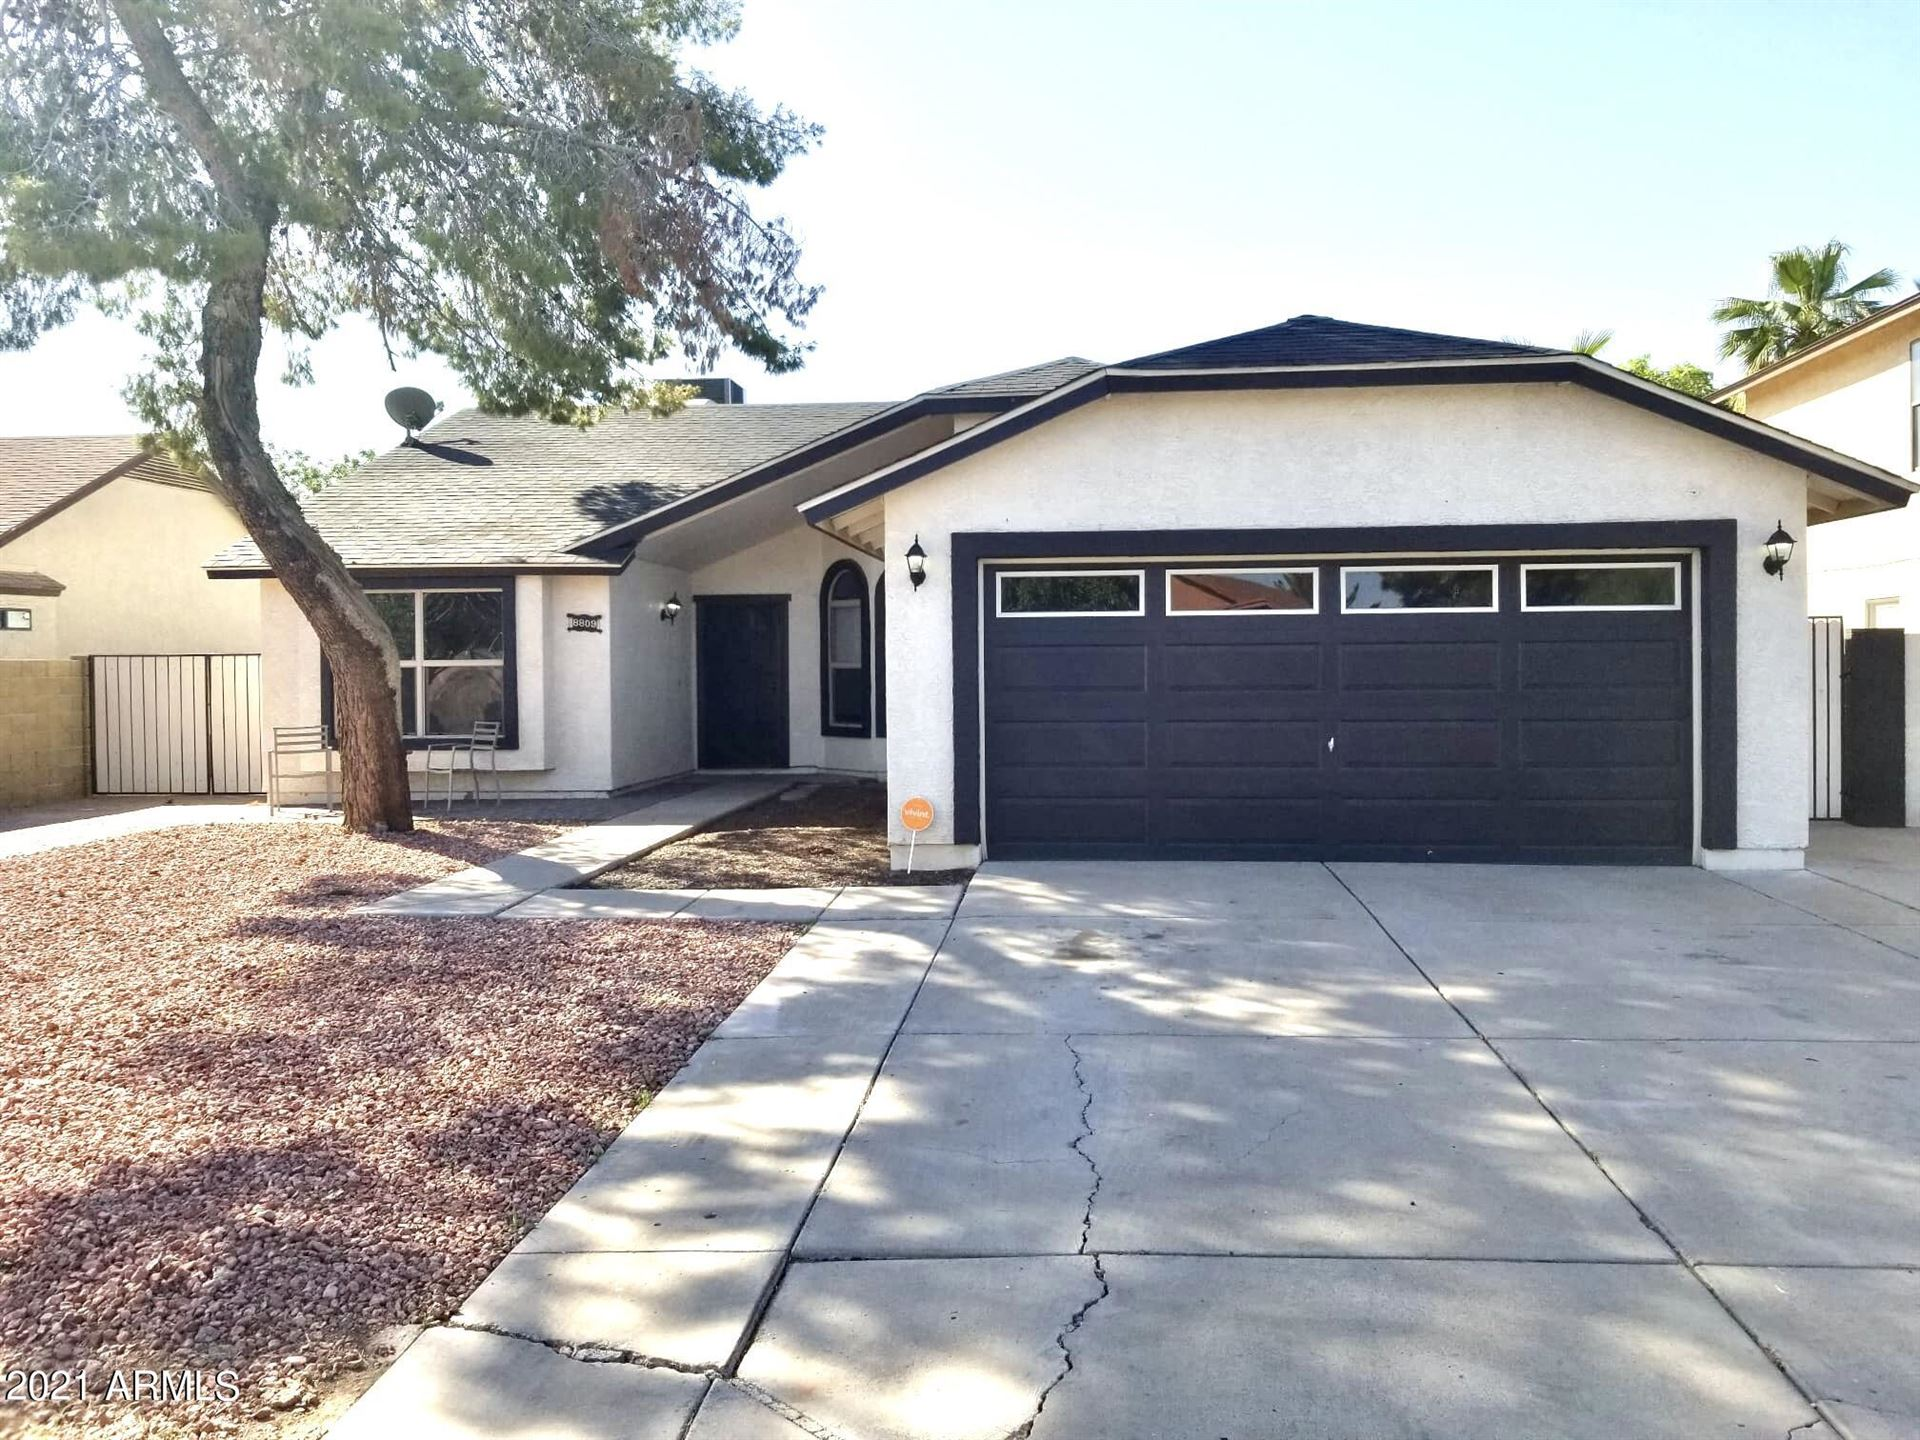 8809 W CAMBRIDGE Avenue, Phoenix, AZ 85037 - MLS#: 6273632